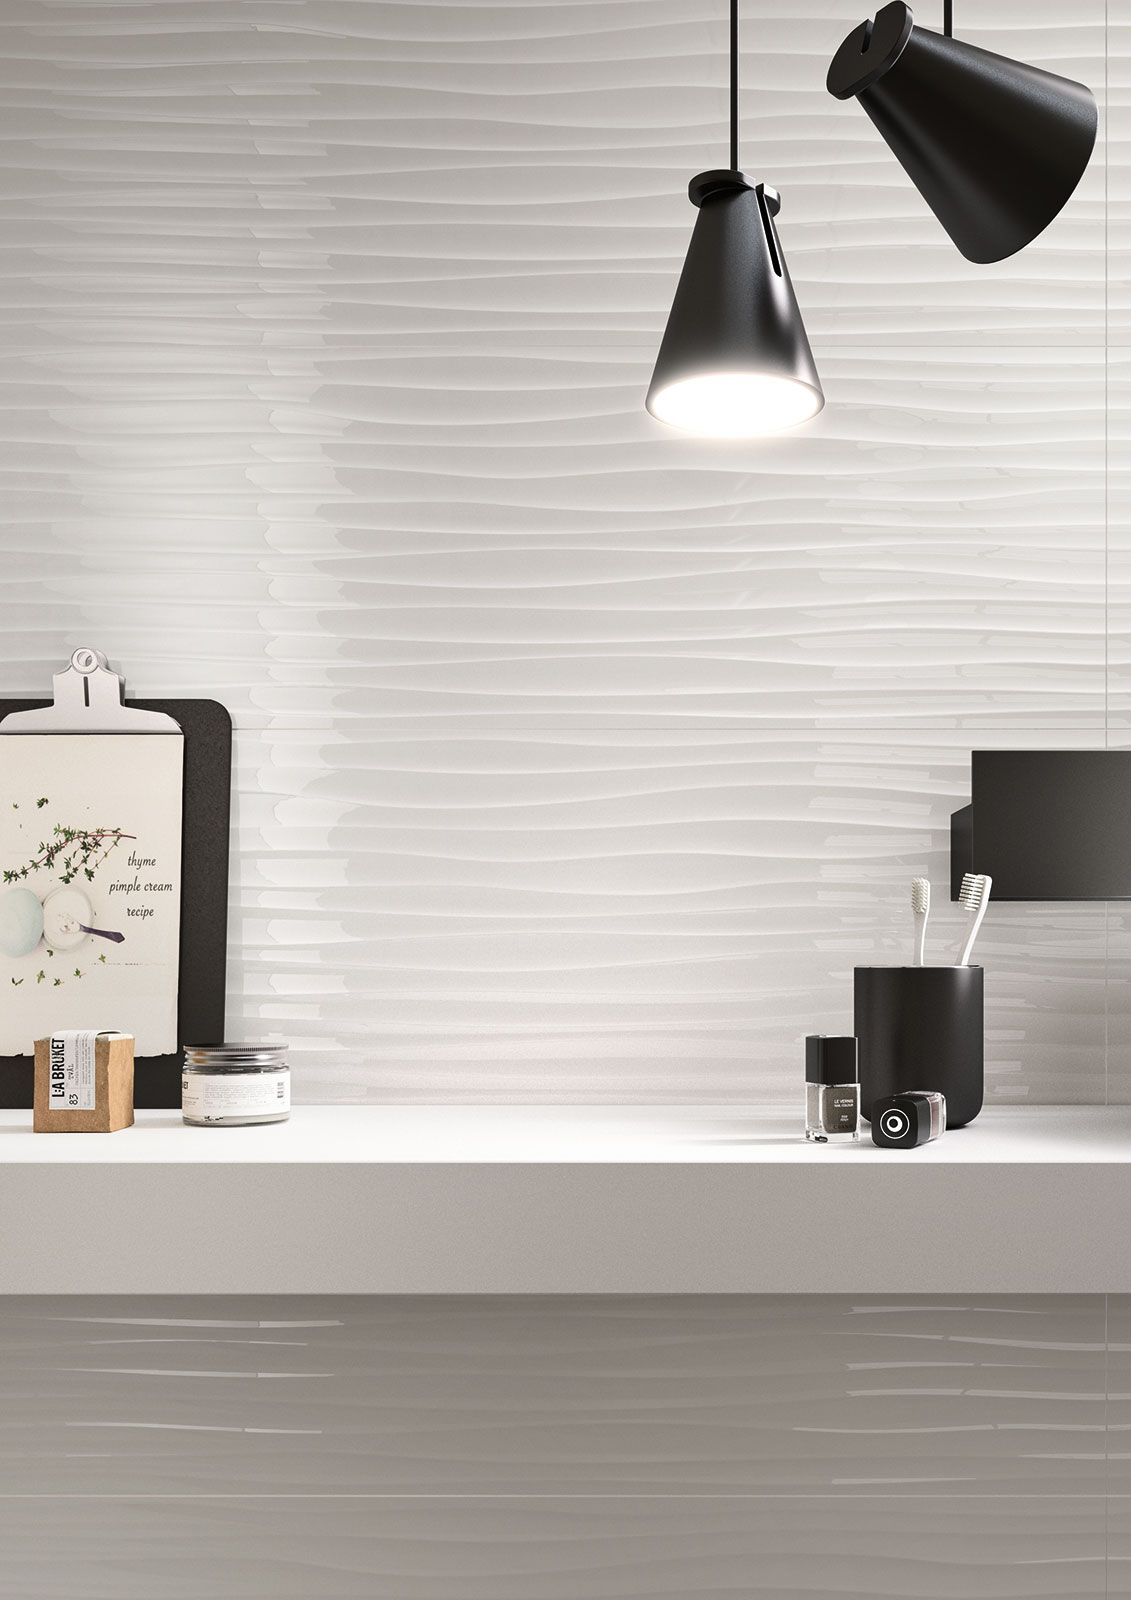 Marazzi Essenziale Wave 3d Lux 40x120 Cm Mmfm Bathroom Interior Design Bathroom Decor Wall Lights